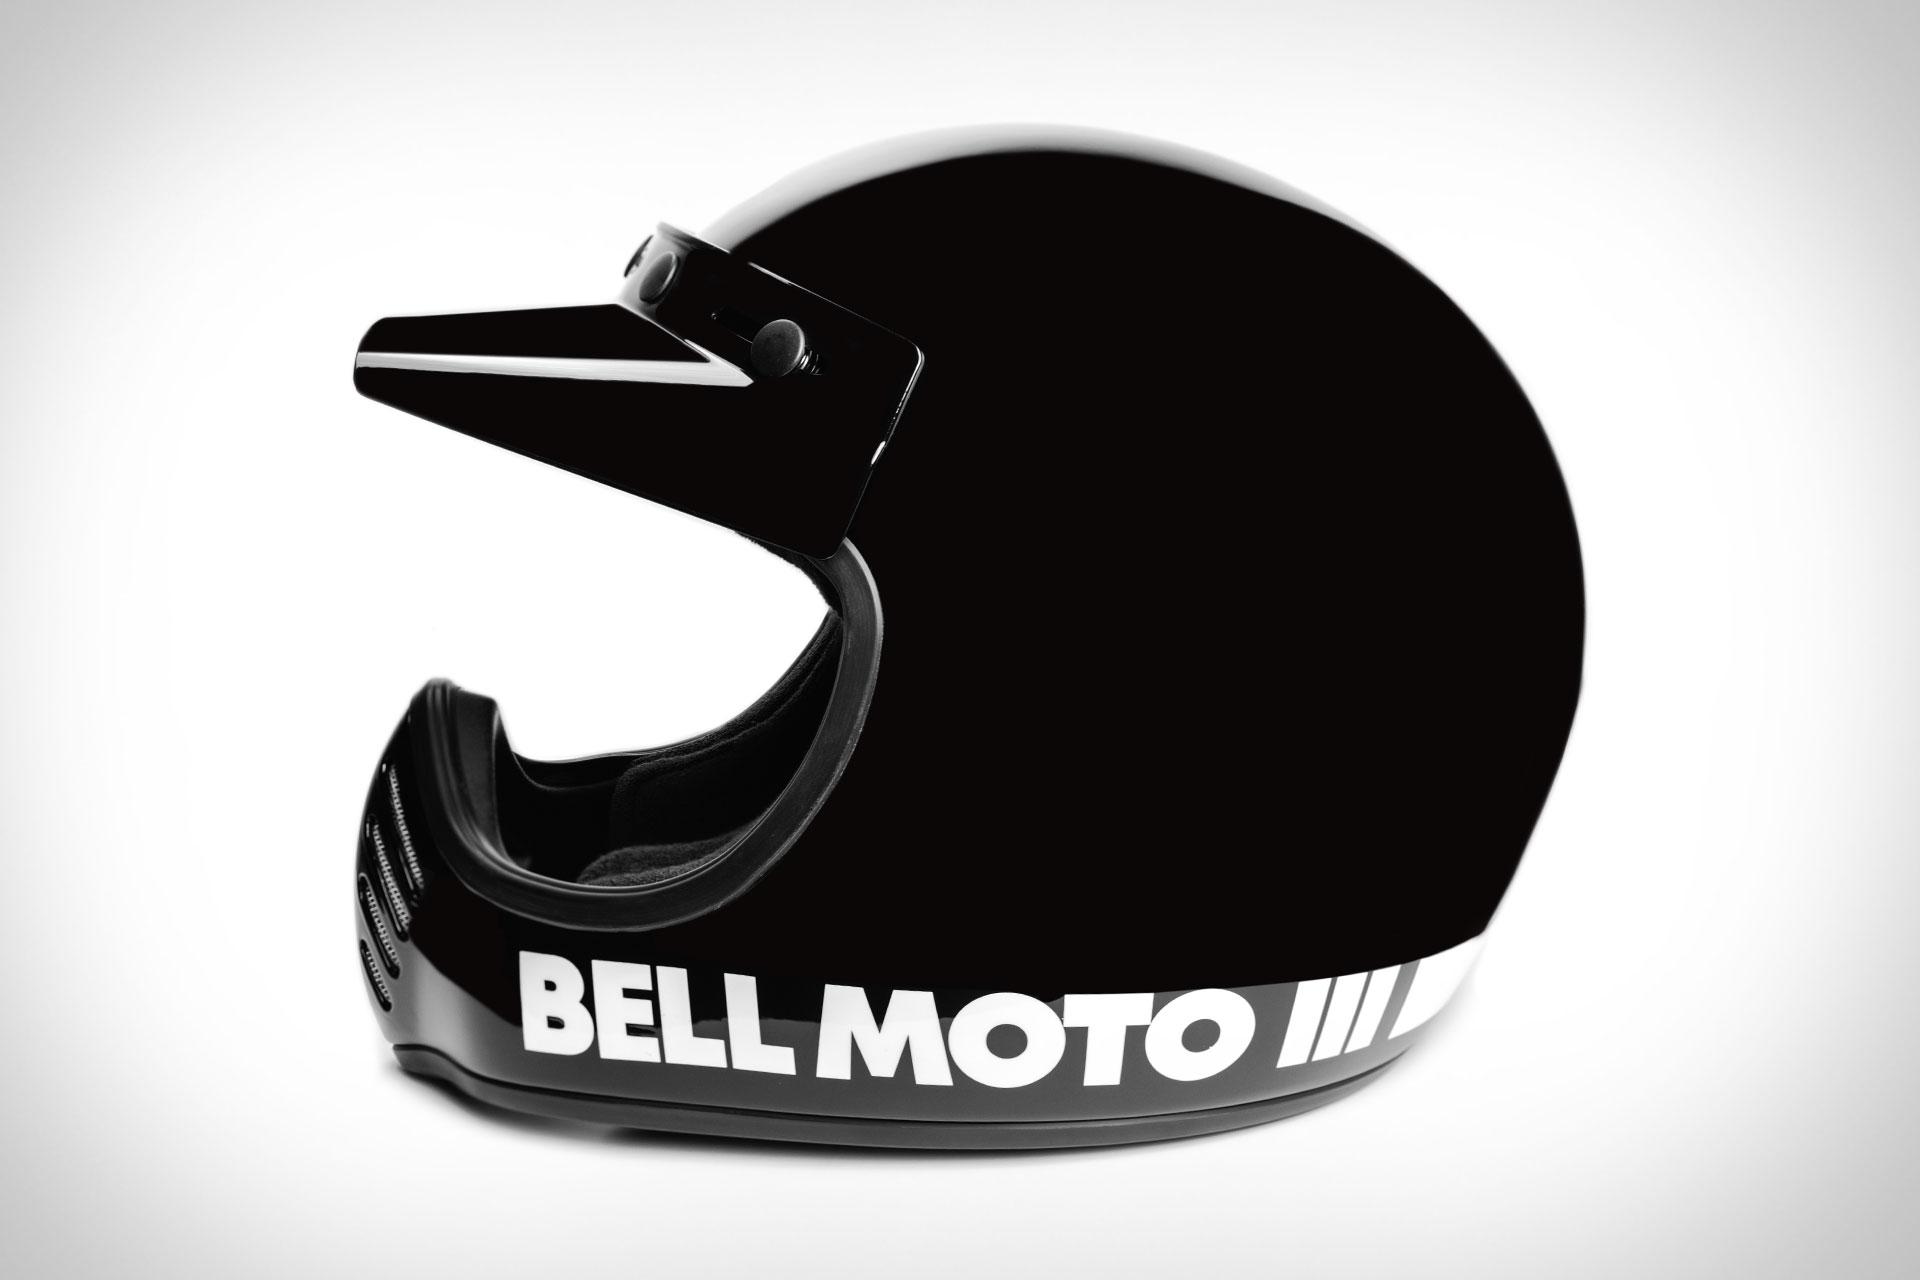 Bell Moto 3 >> Bell Moto 3 Helmet